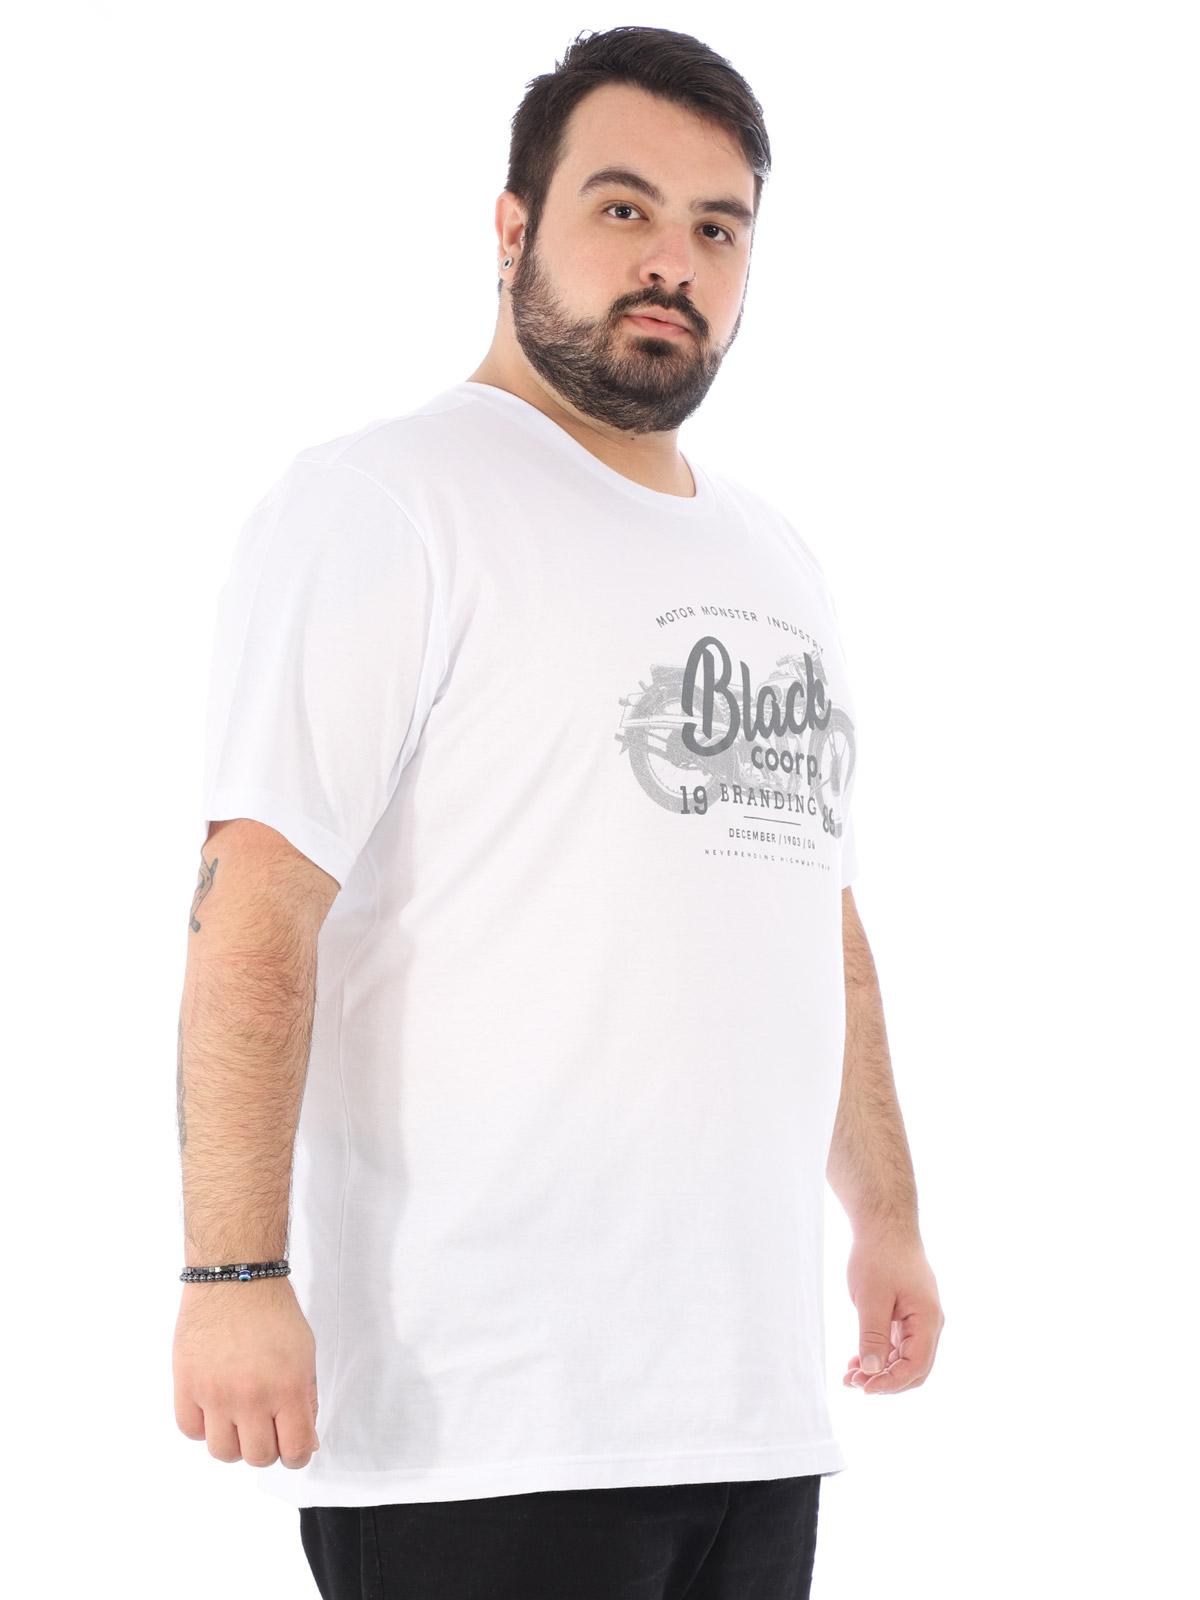 Camiseta Plus Size Masculina Estampa Black Anistia Branca